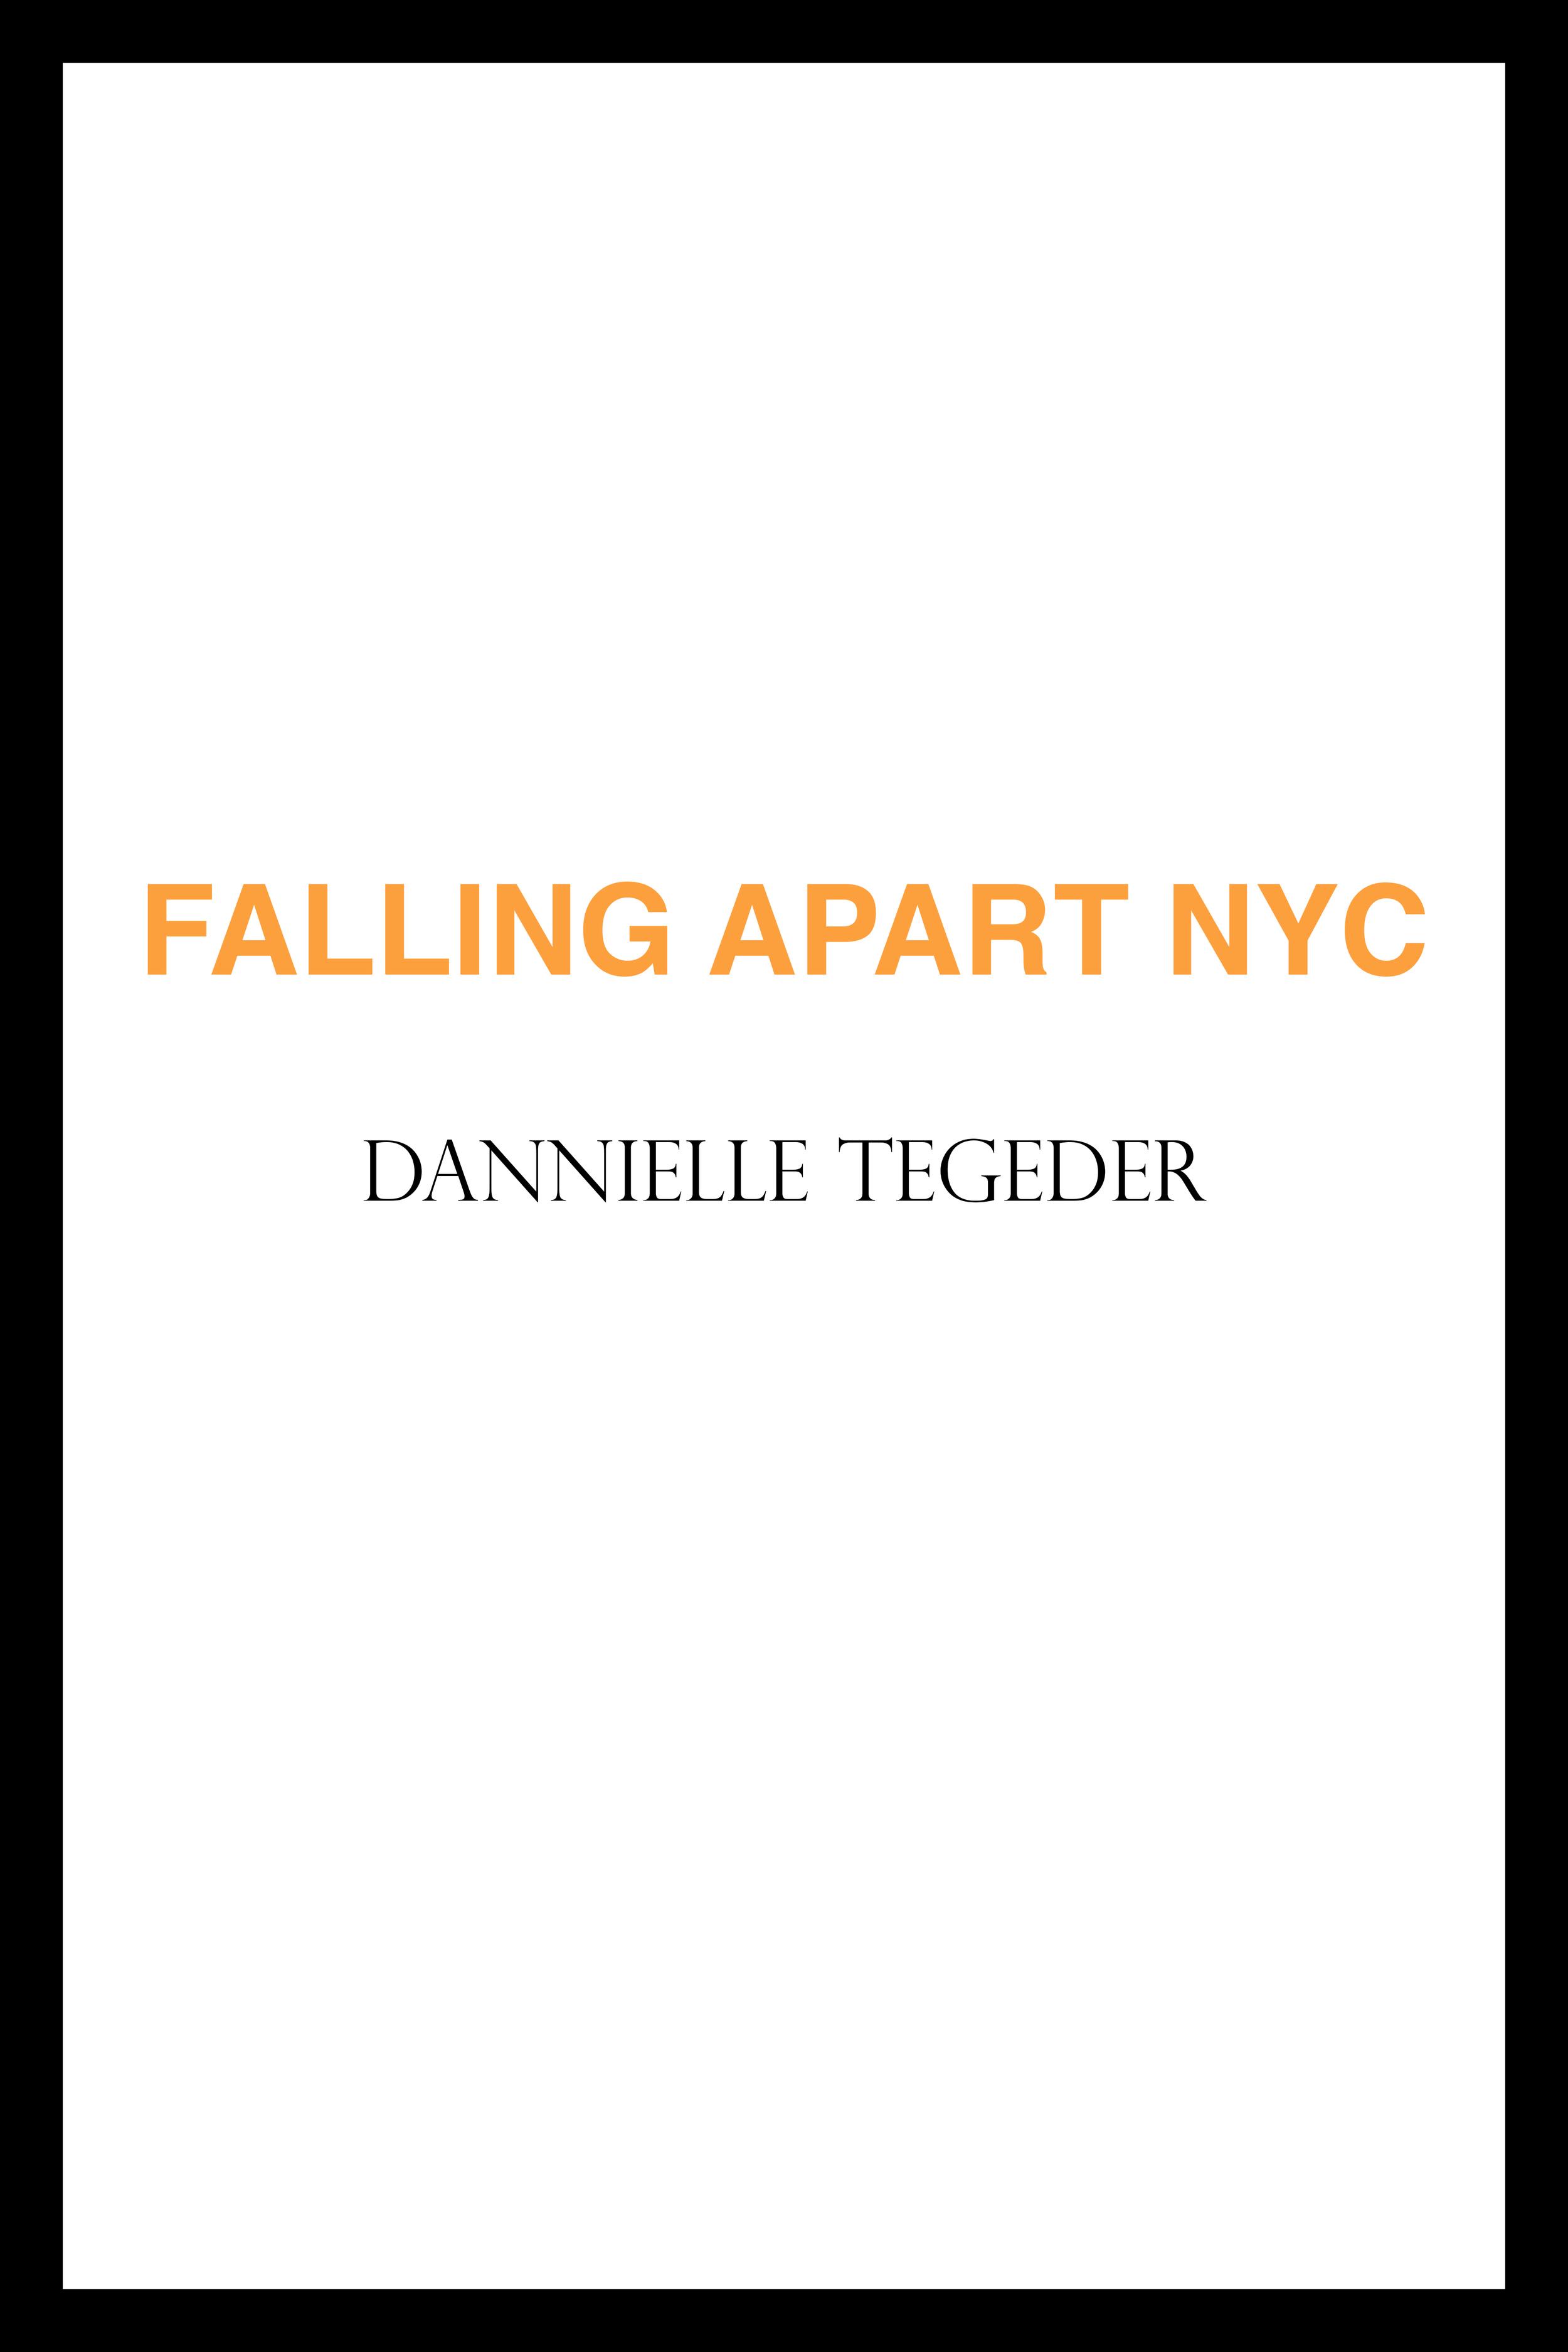 Falling Apart NYC on Ubu Editions